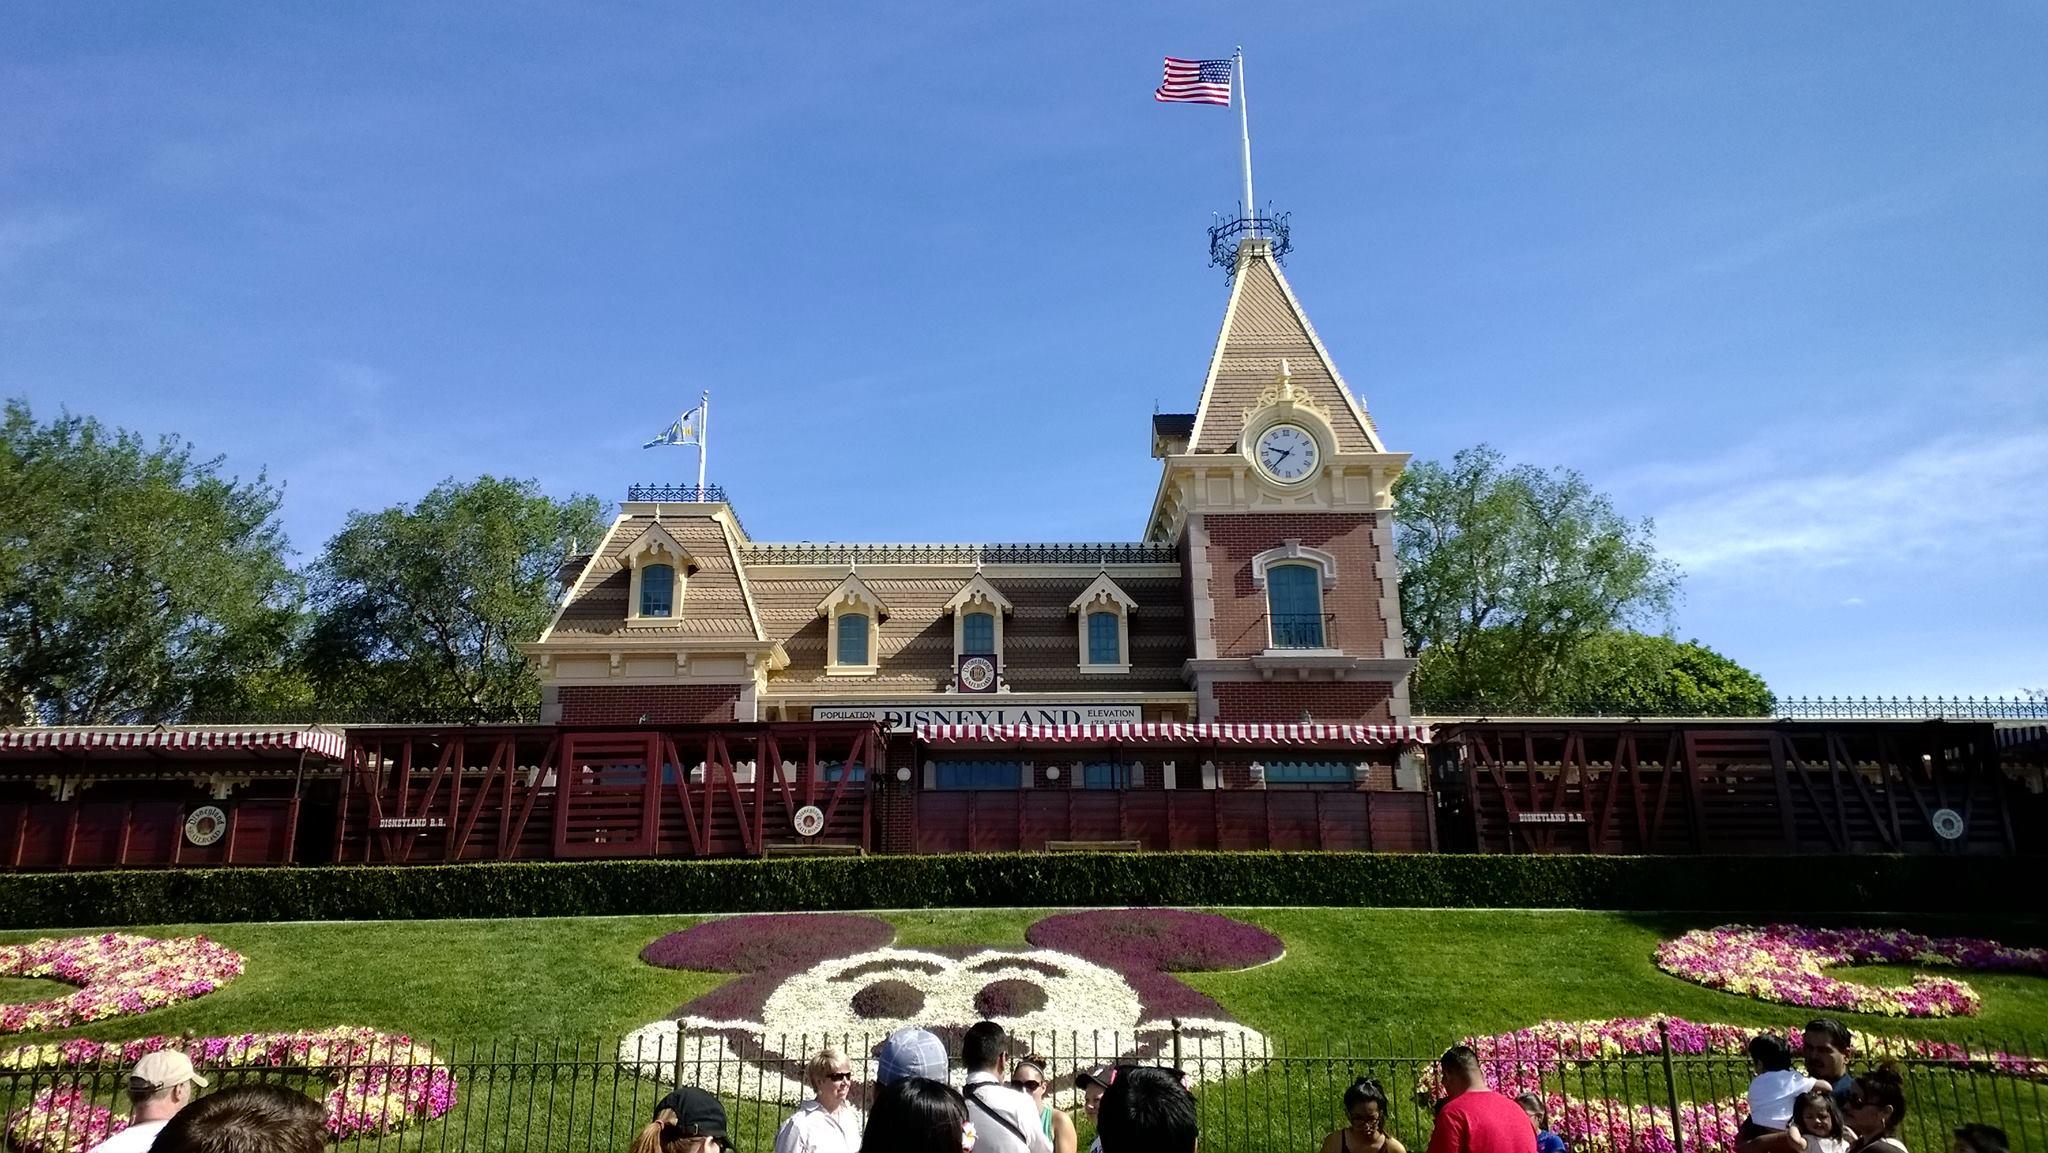 Recognizing Design Entering Disneyland